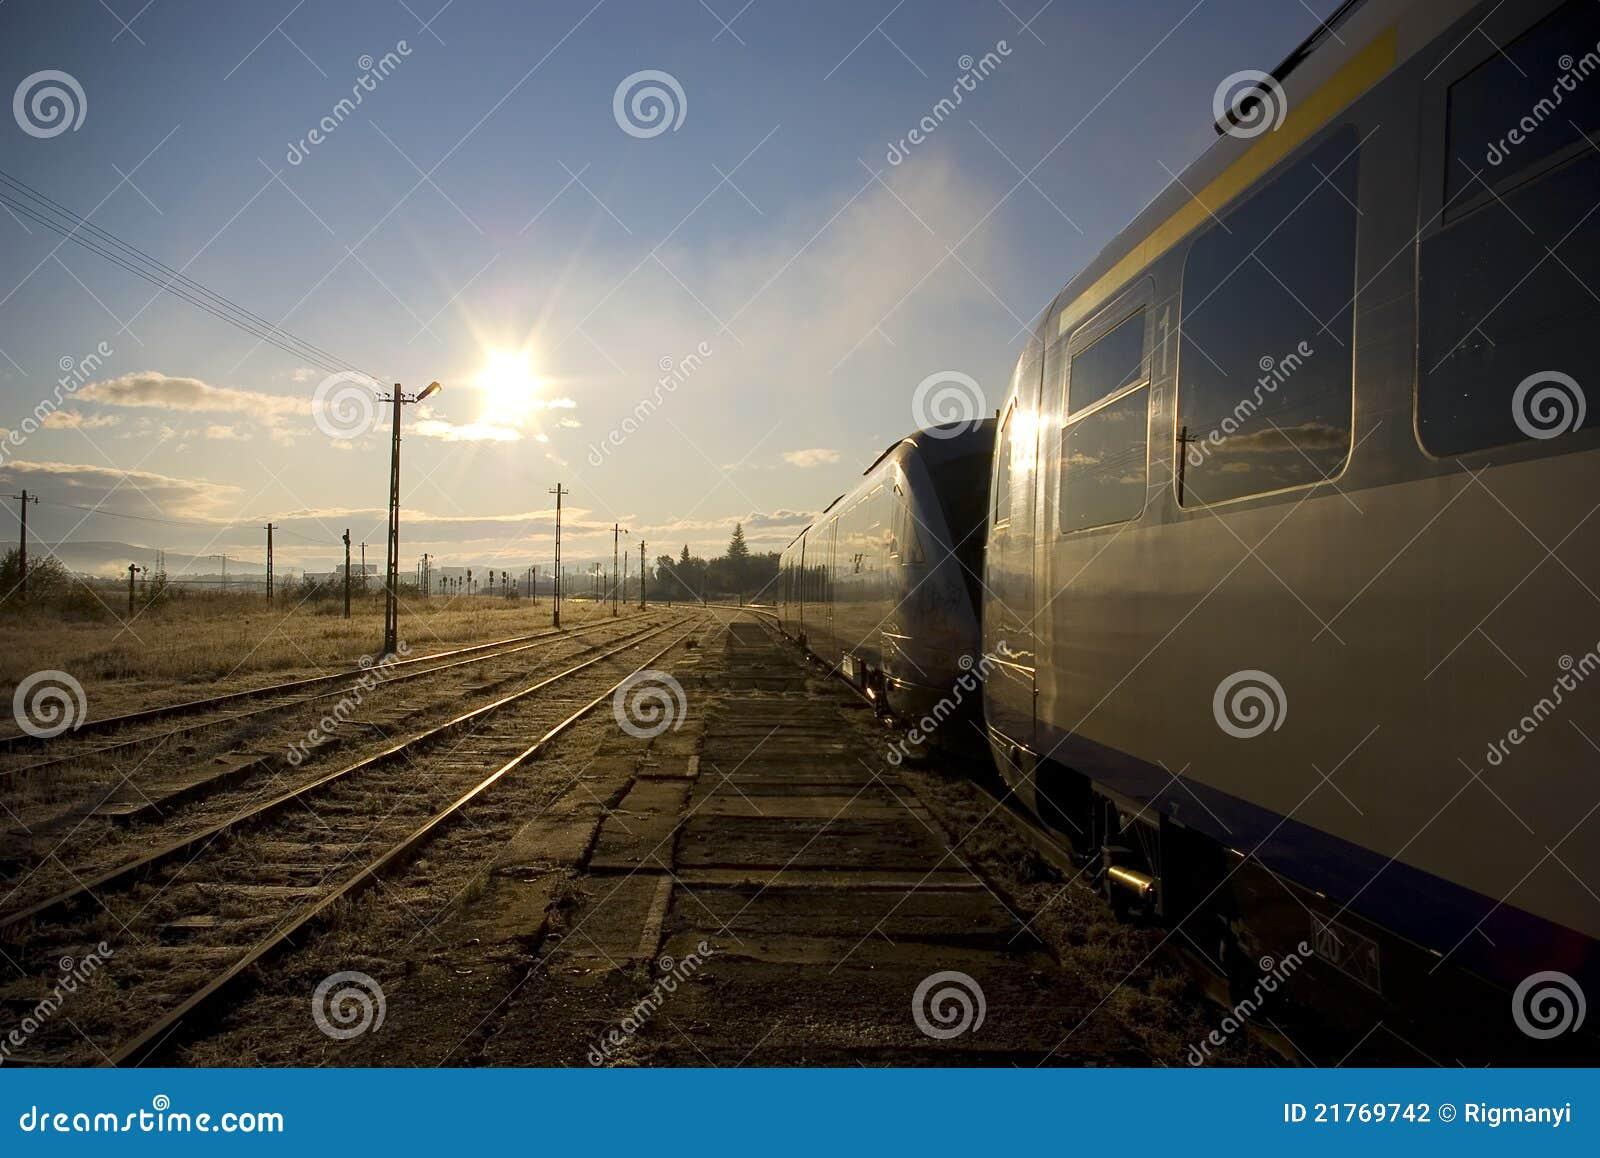 Train at a railway station